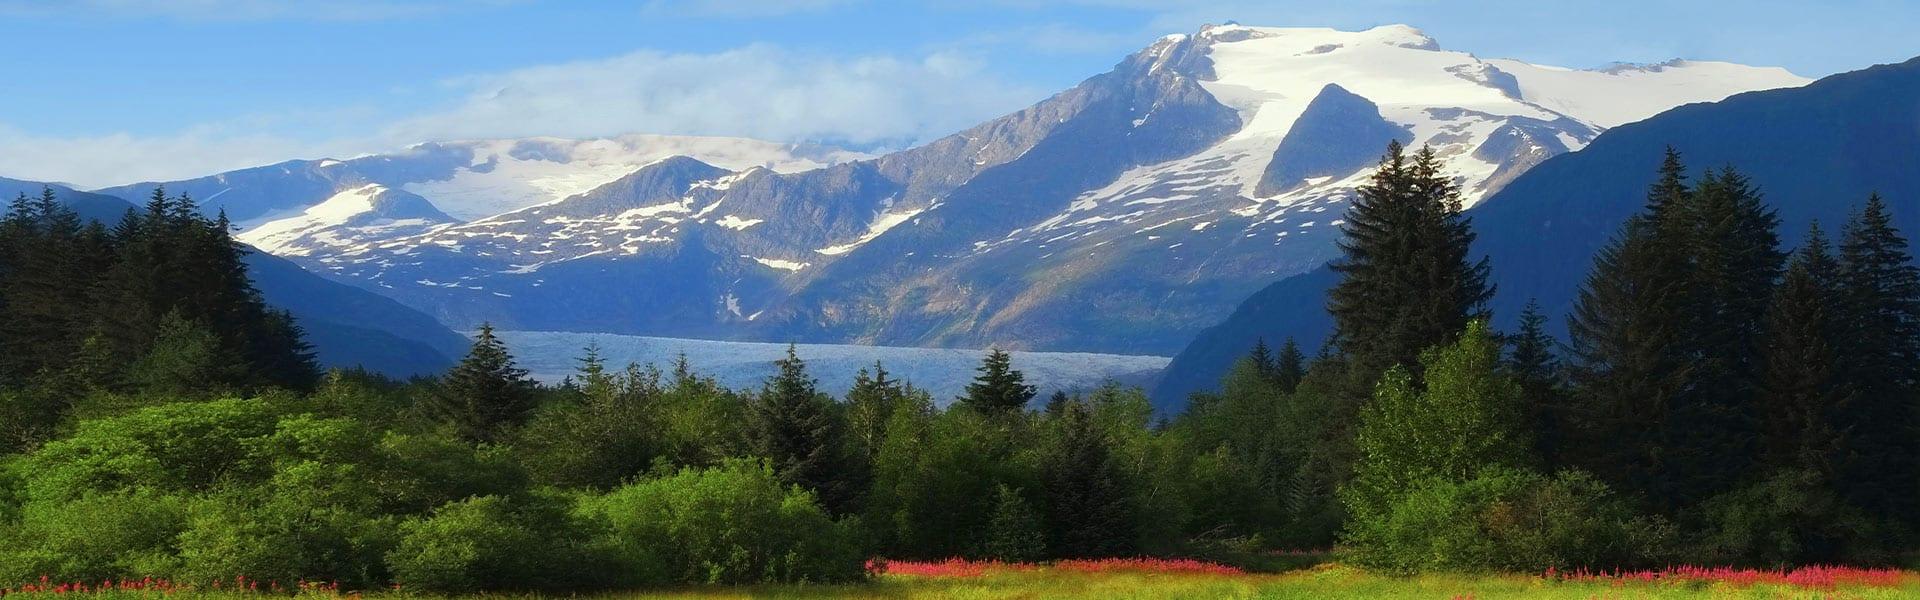 Alasca:Glacier Bay & Juneau